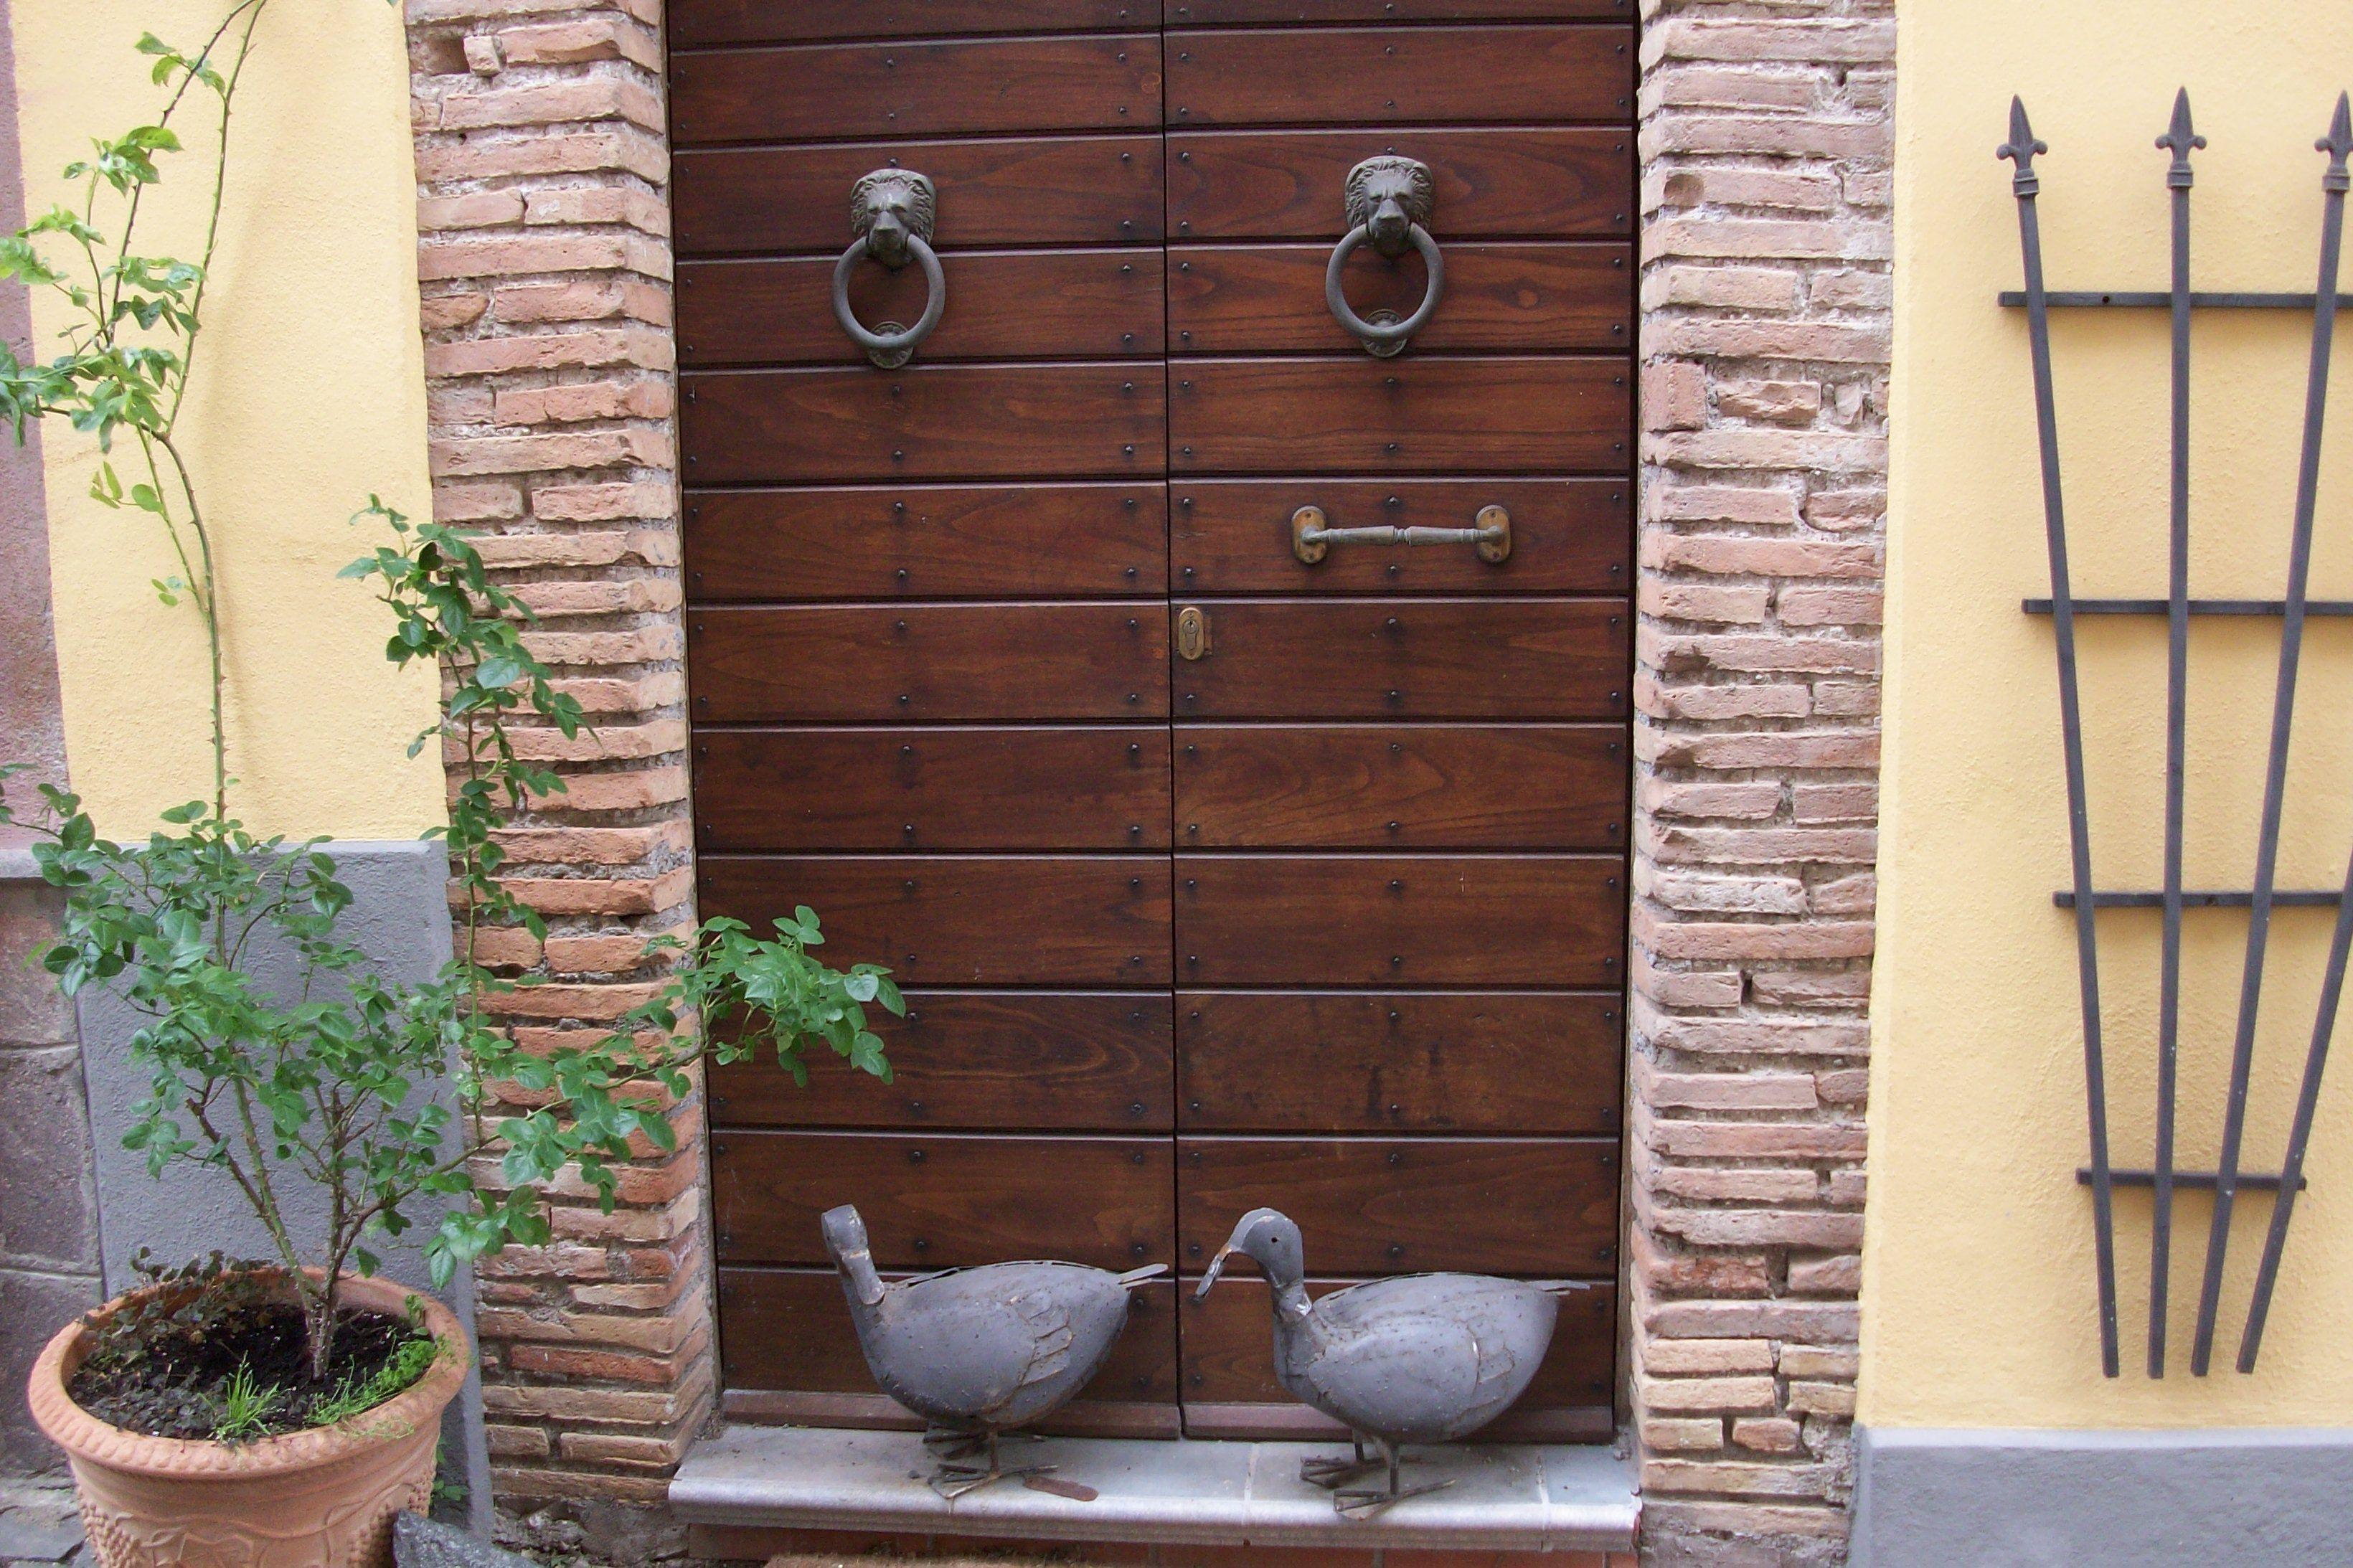 decorated doorway  of Castel Cellesi, VT